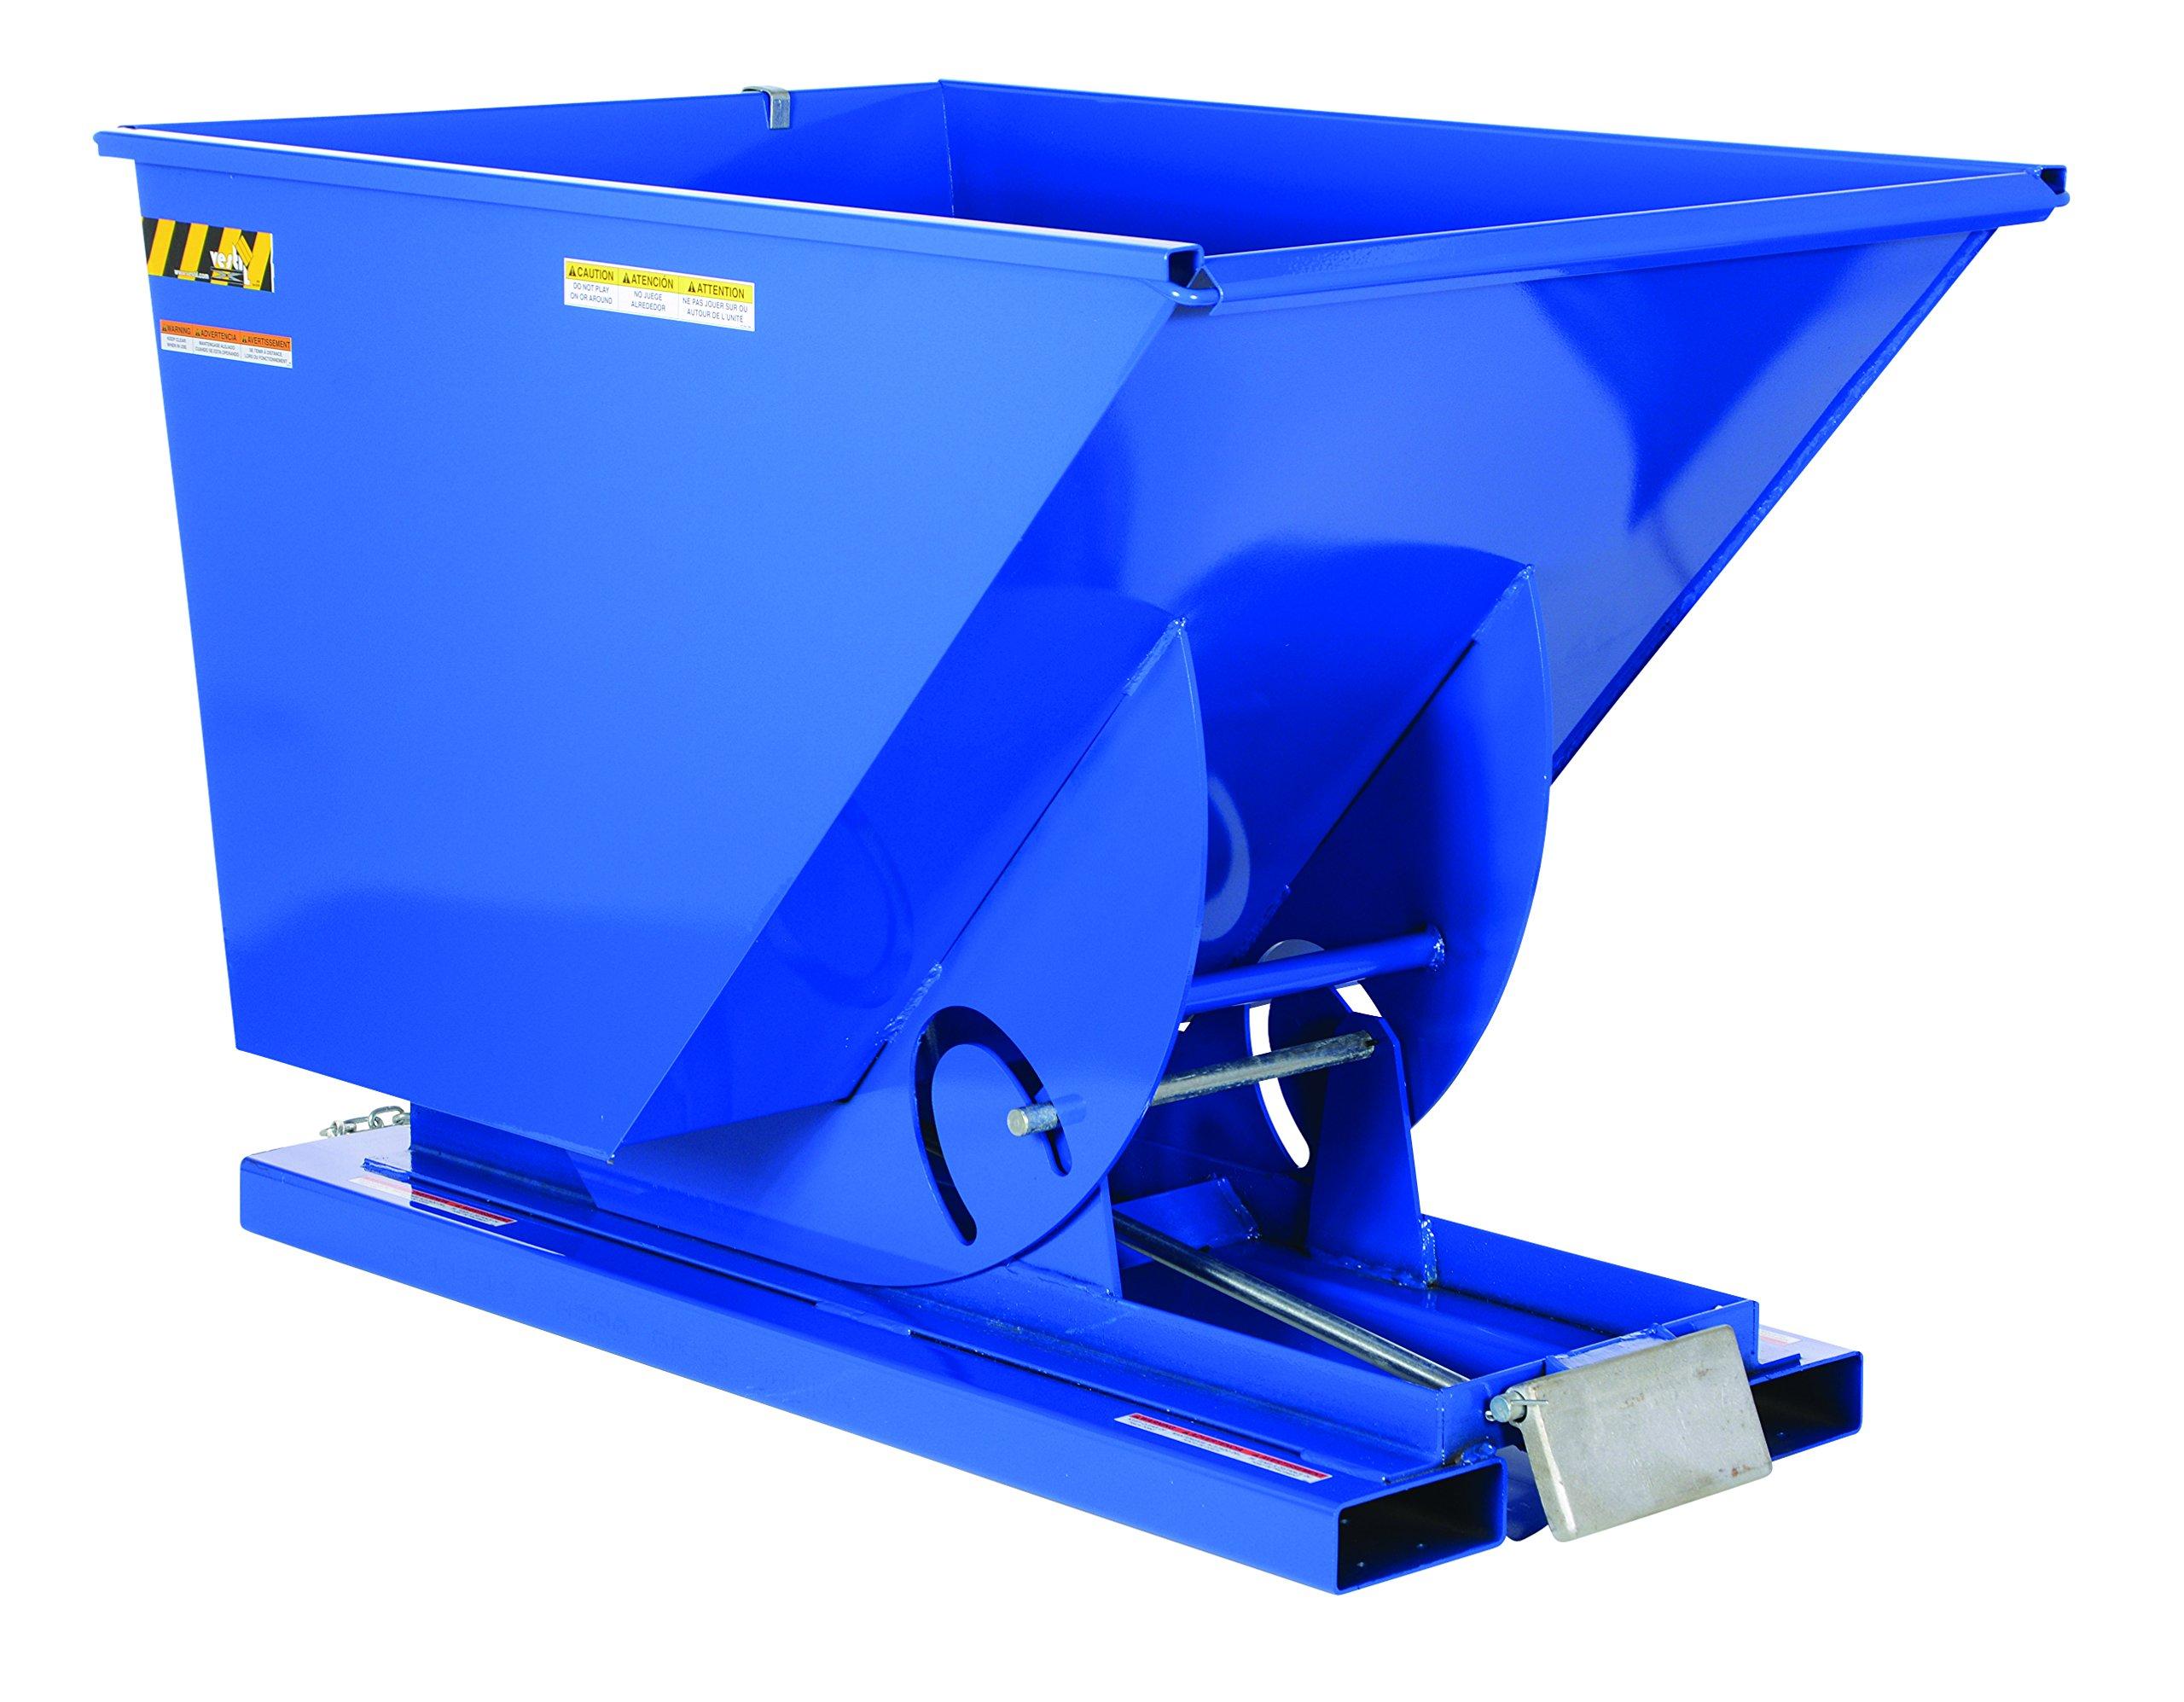 Vestil D-150-MD Medium Duty Self-Dumping Hopper with Bumper Release, Steel, 4000 lb. Capacity, Overall L x W x H (in.) 68-3/8'' x 43-9/16'' x 51-13/16'', Blue